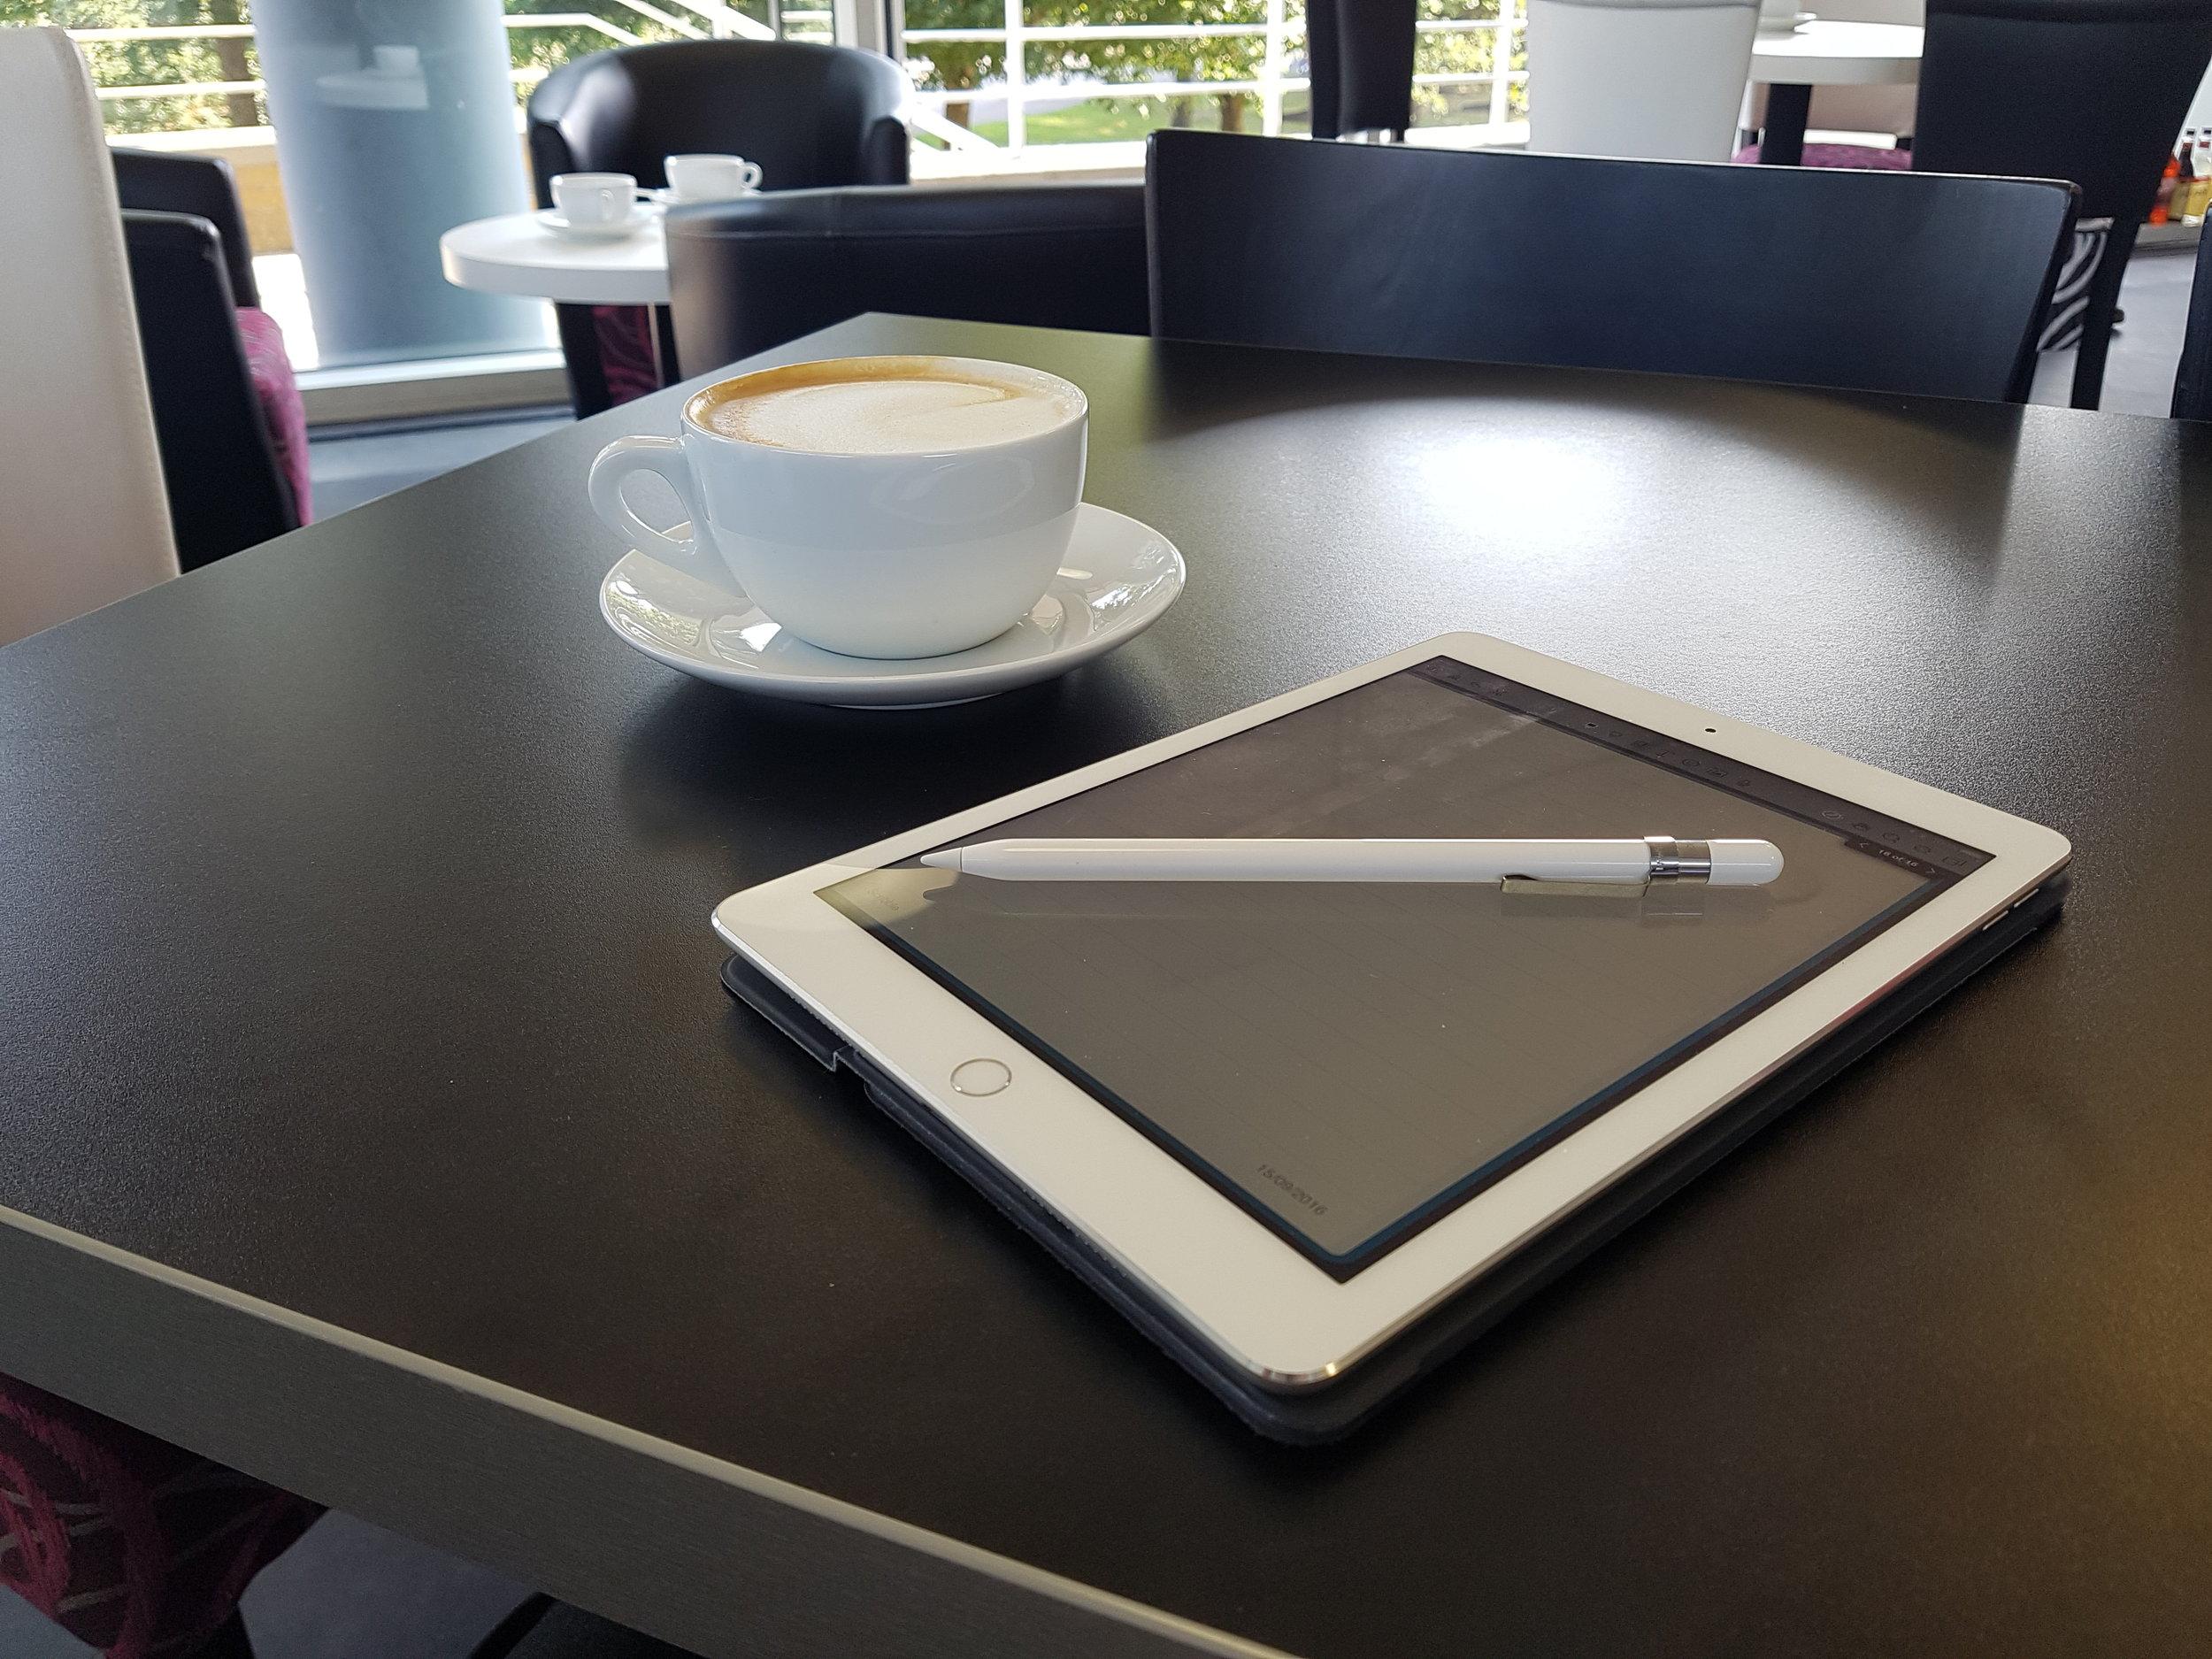 ipad-pro-coffee-shop.jpg